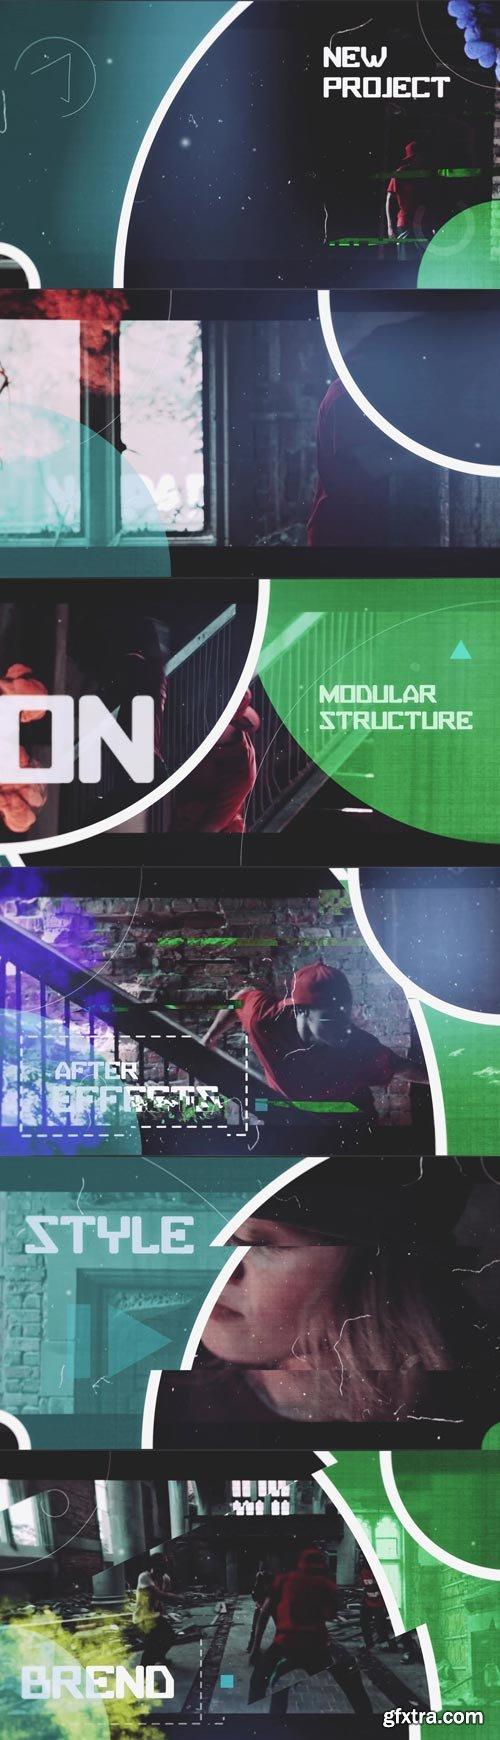 MotionElements - Motion Shape Slideshow - 11658404